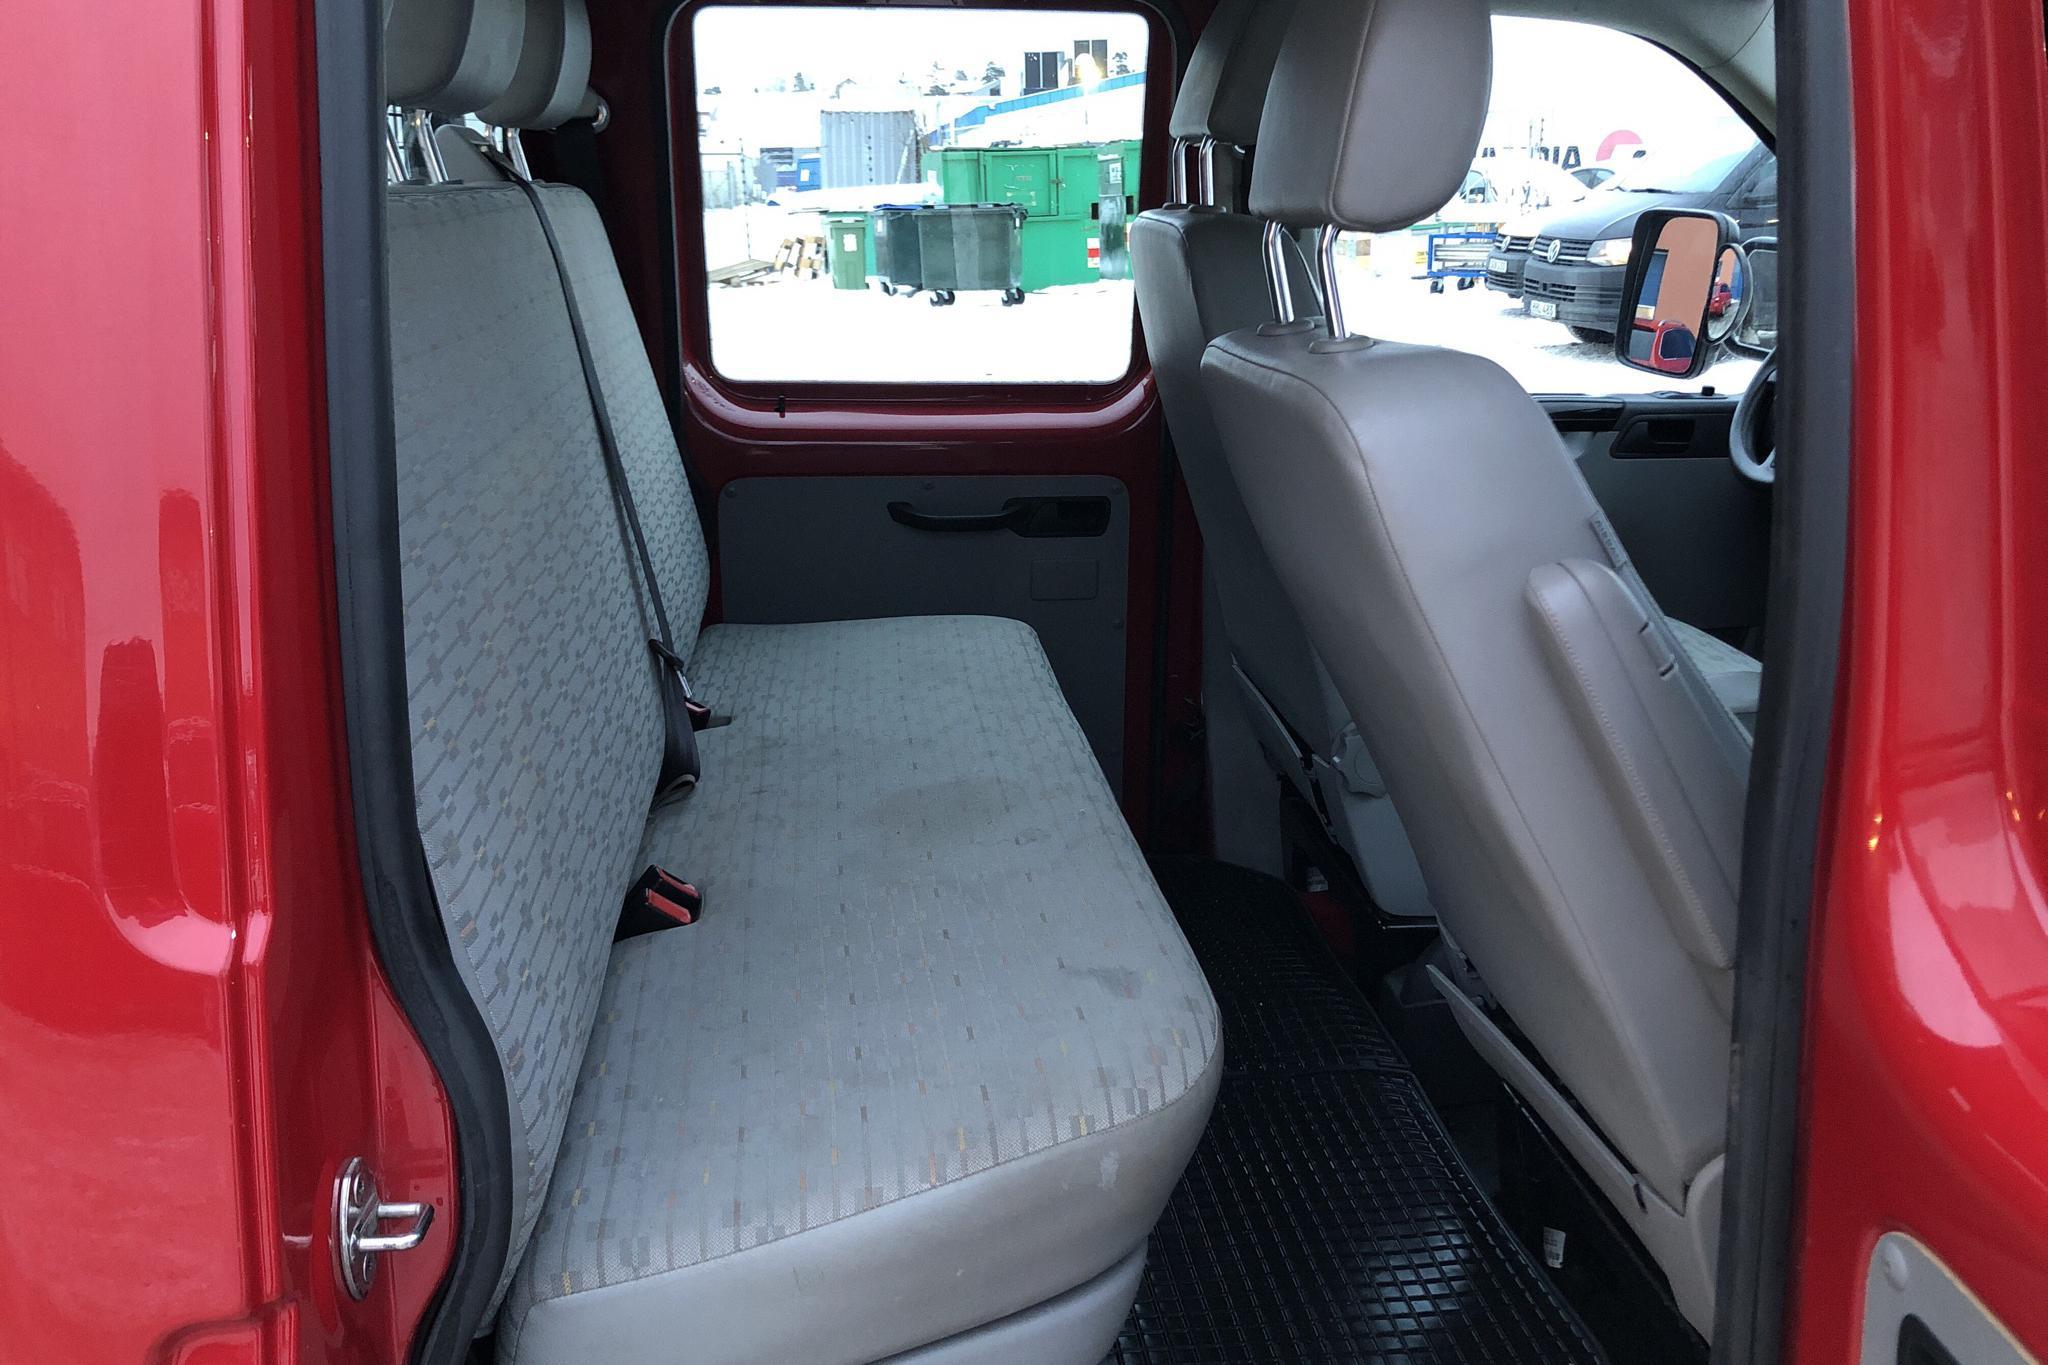 VW Transporter T5 2.0 TDI Pickup (140hk) - 11 063 mil - Automat - röd - 2010